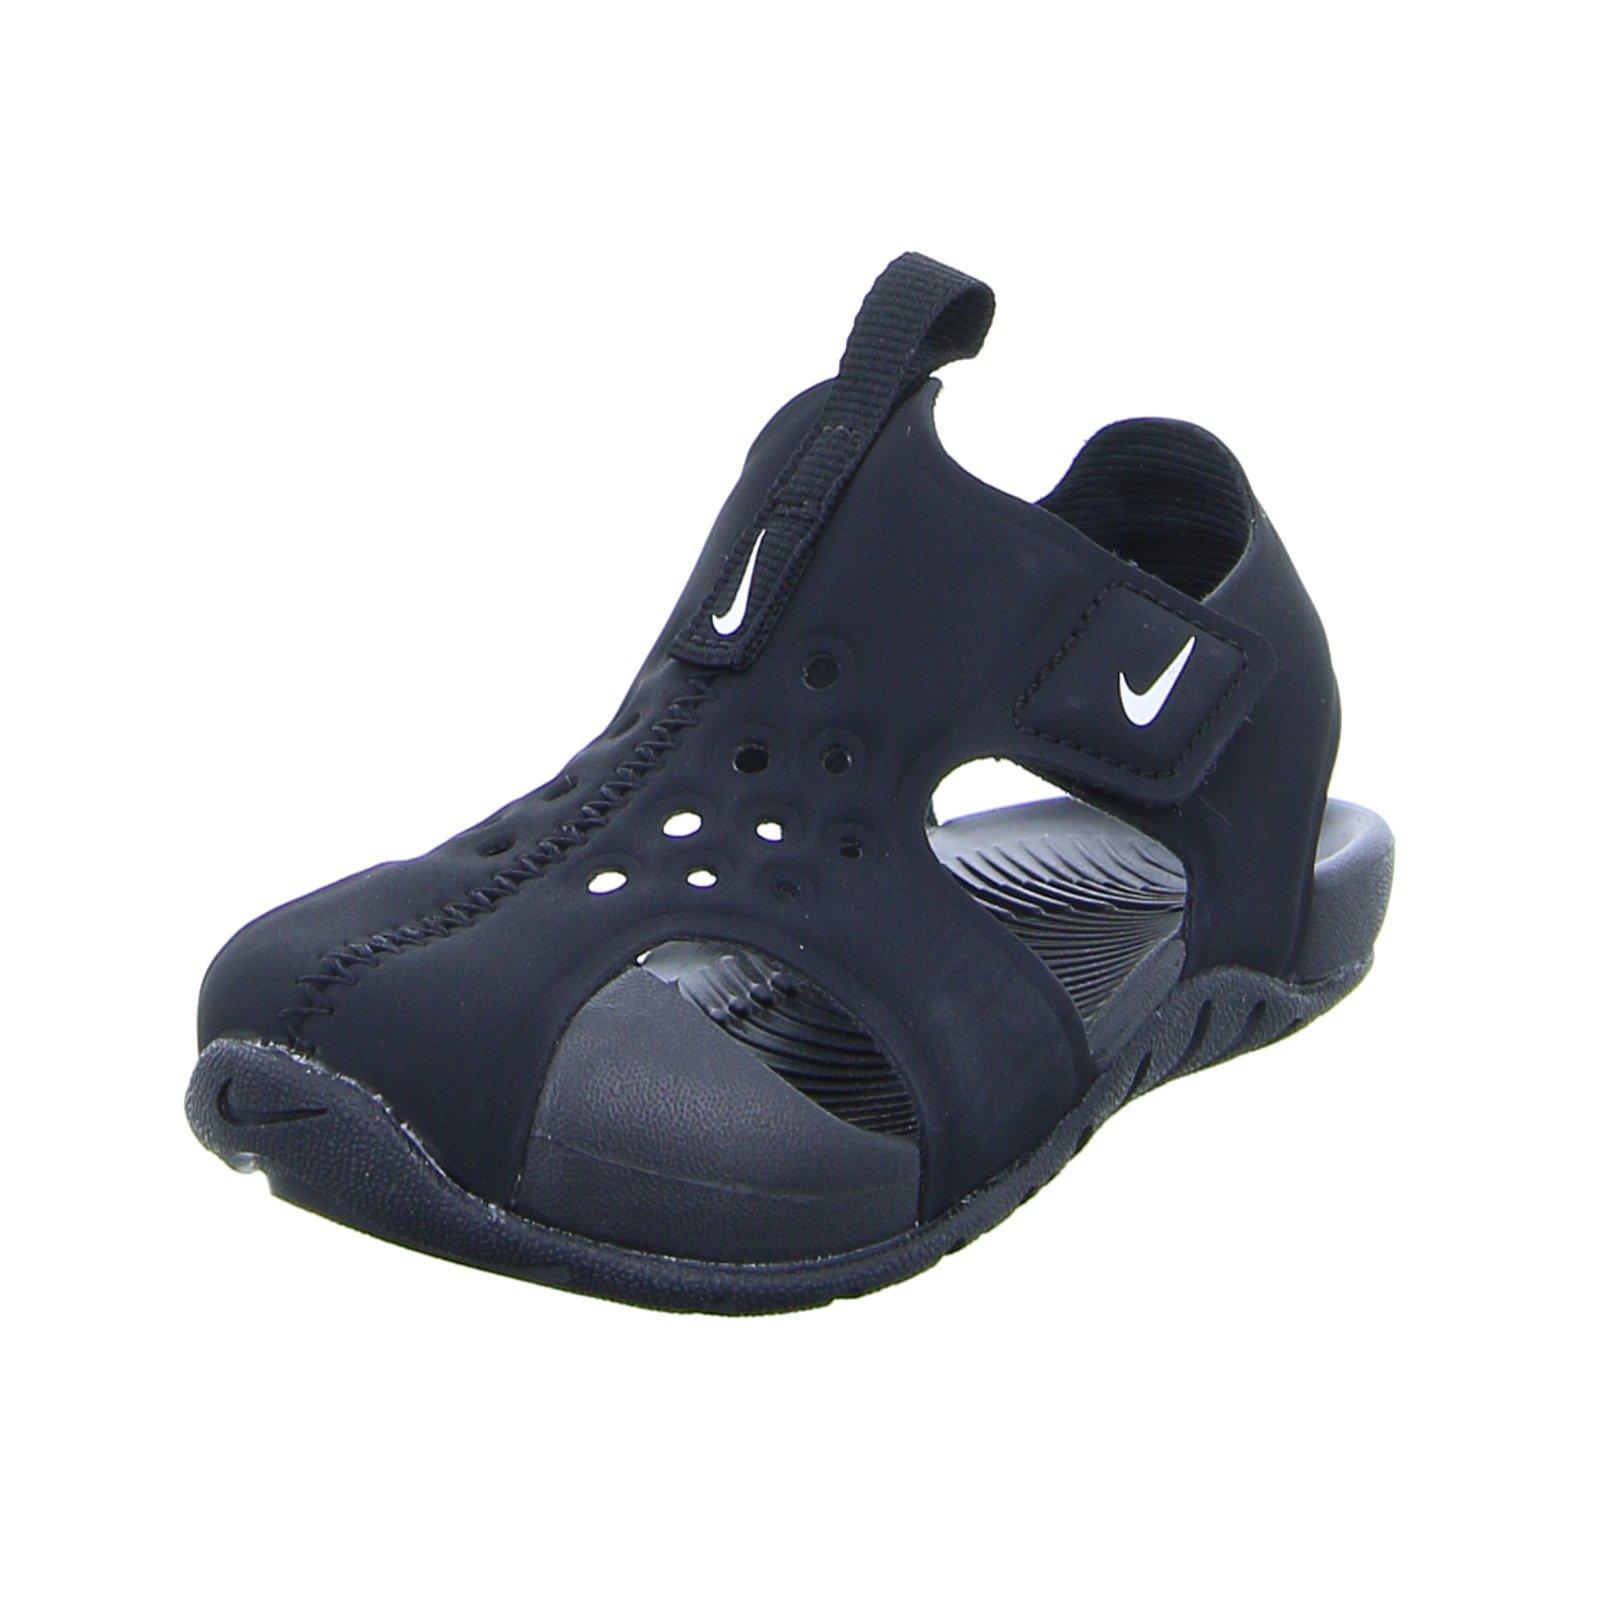 NIKE Toddler Sunray Protect 2 (TD) Black White Size 6